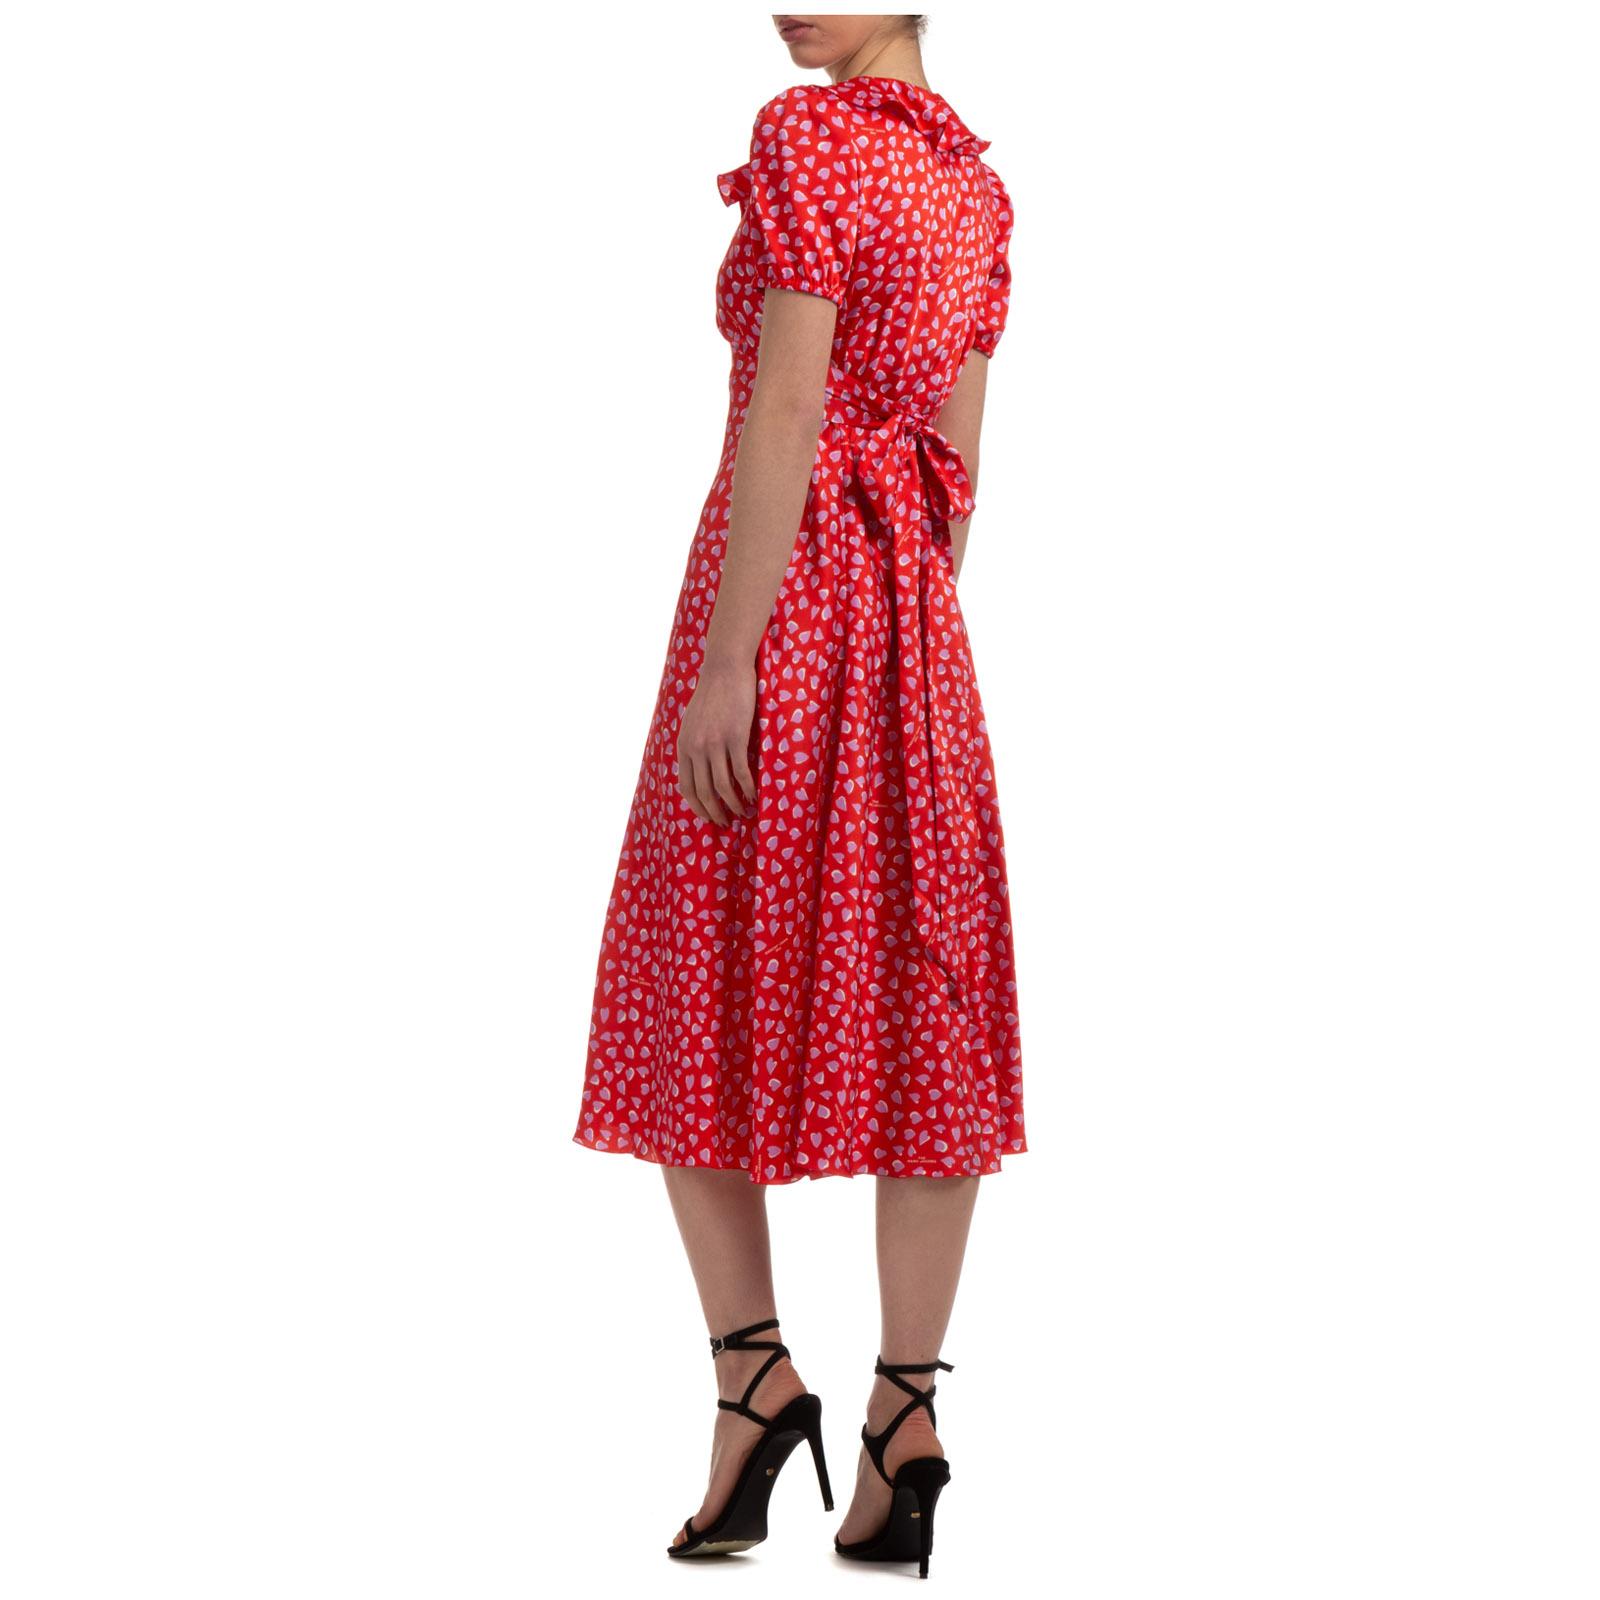 Marc Jacobs WOMEN'S KNEE LENGTH DRESS SHORT SLEEVE